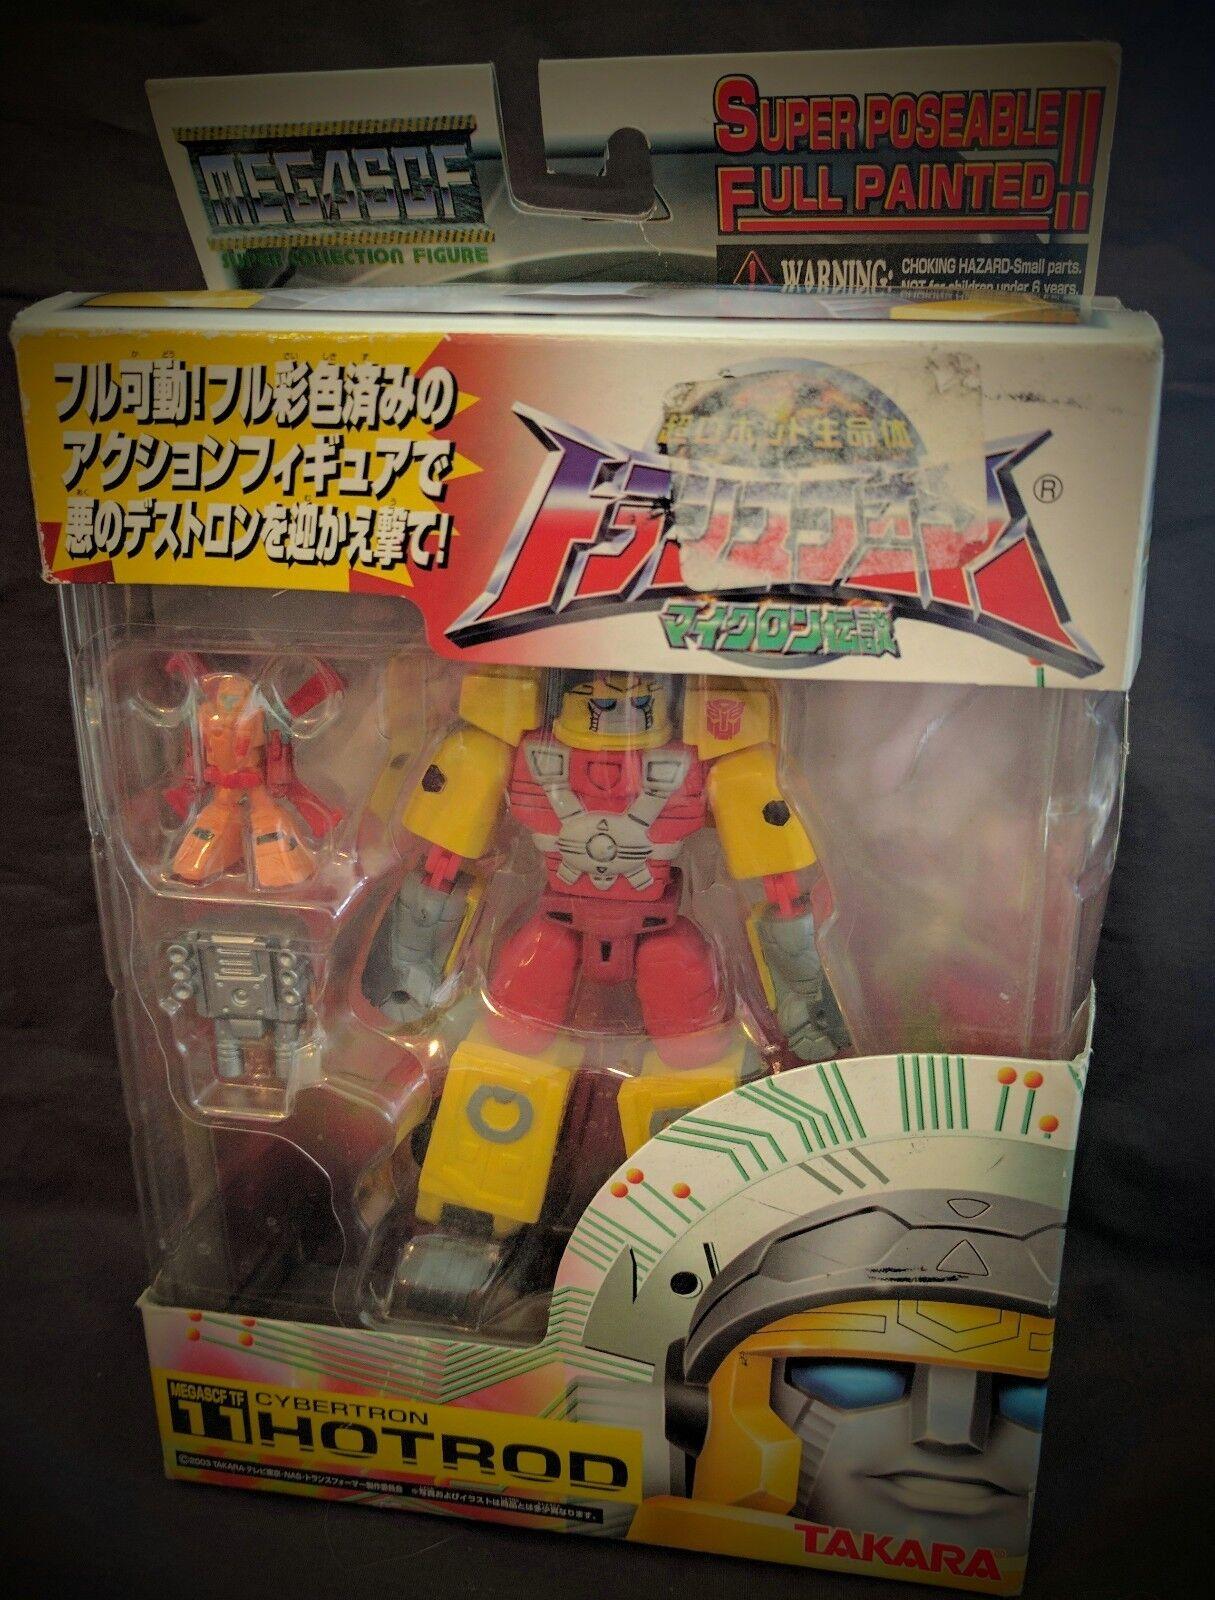 MEGASCF Transformers Cybertron HOTROD Takara MISB